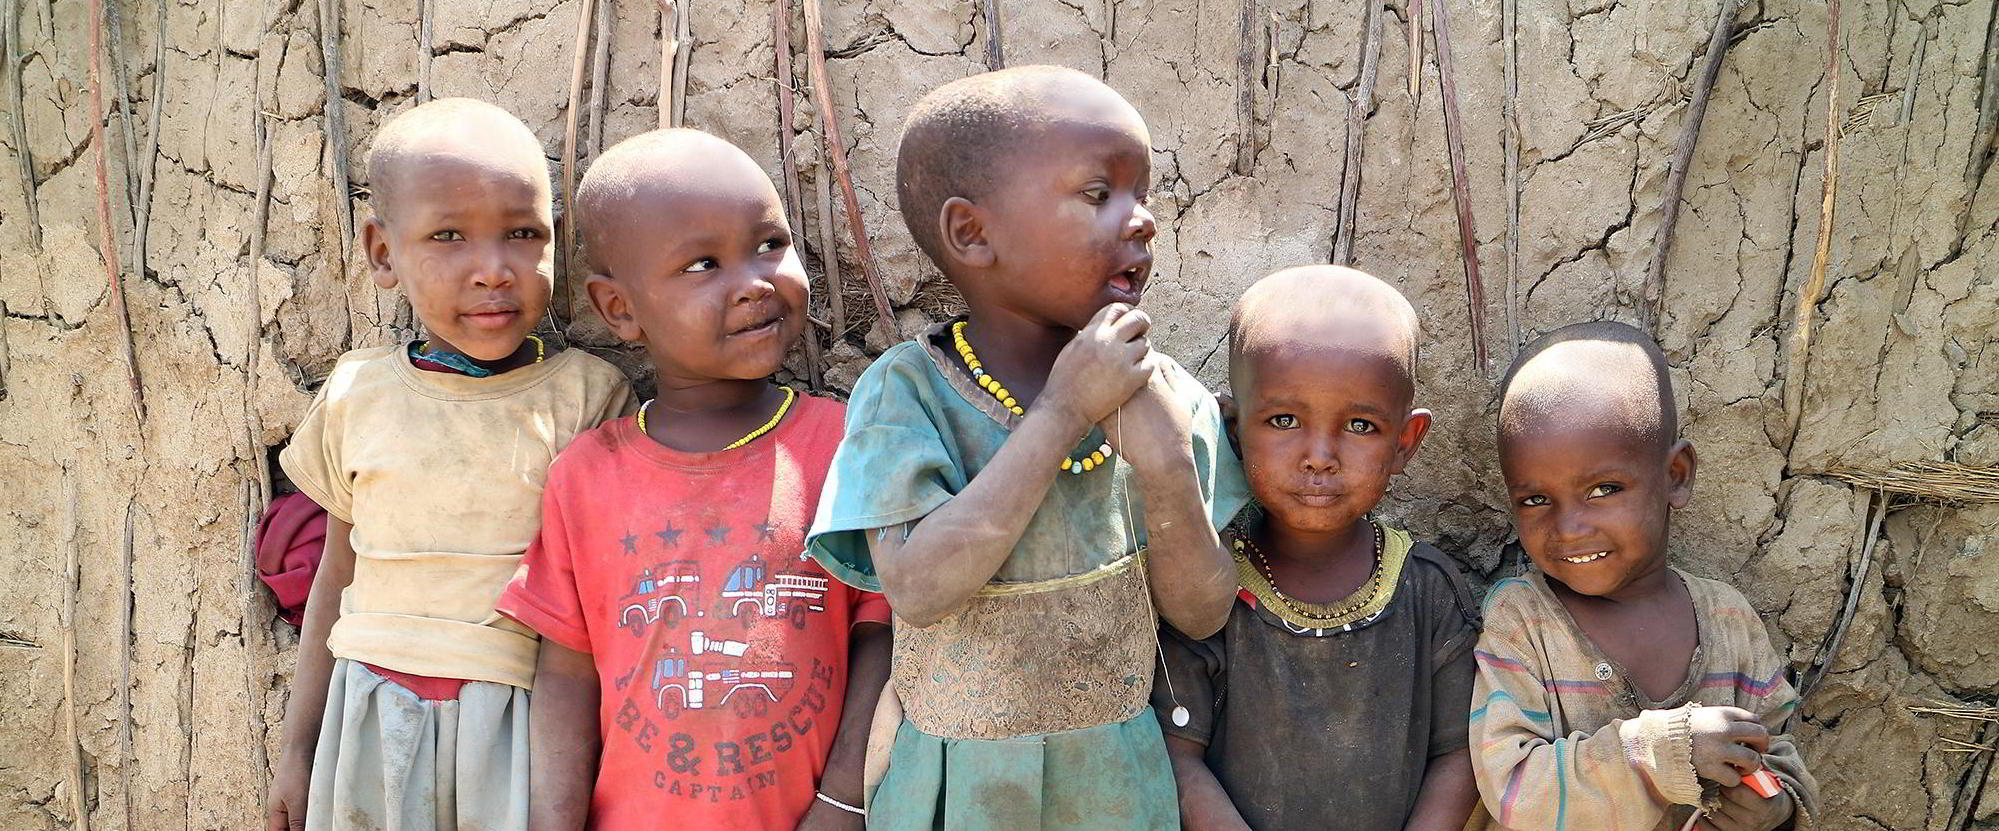 Kindern in Afrika helfen!